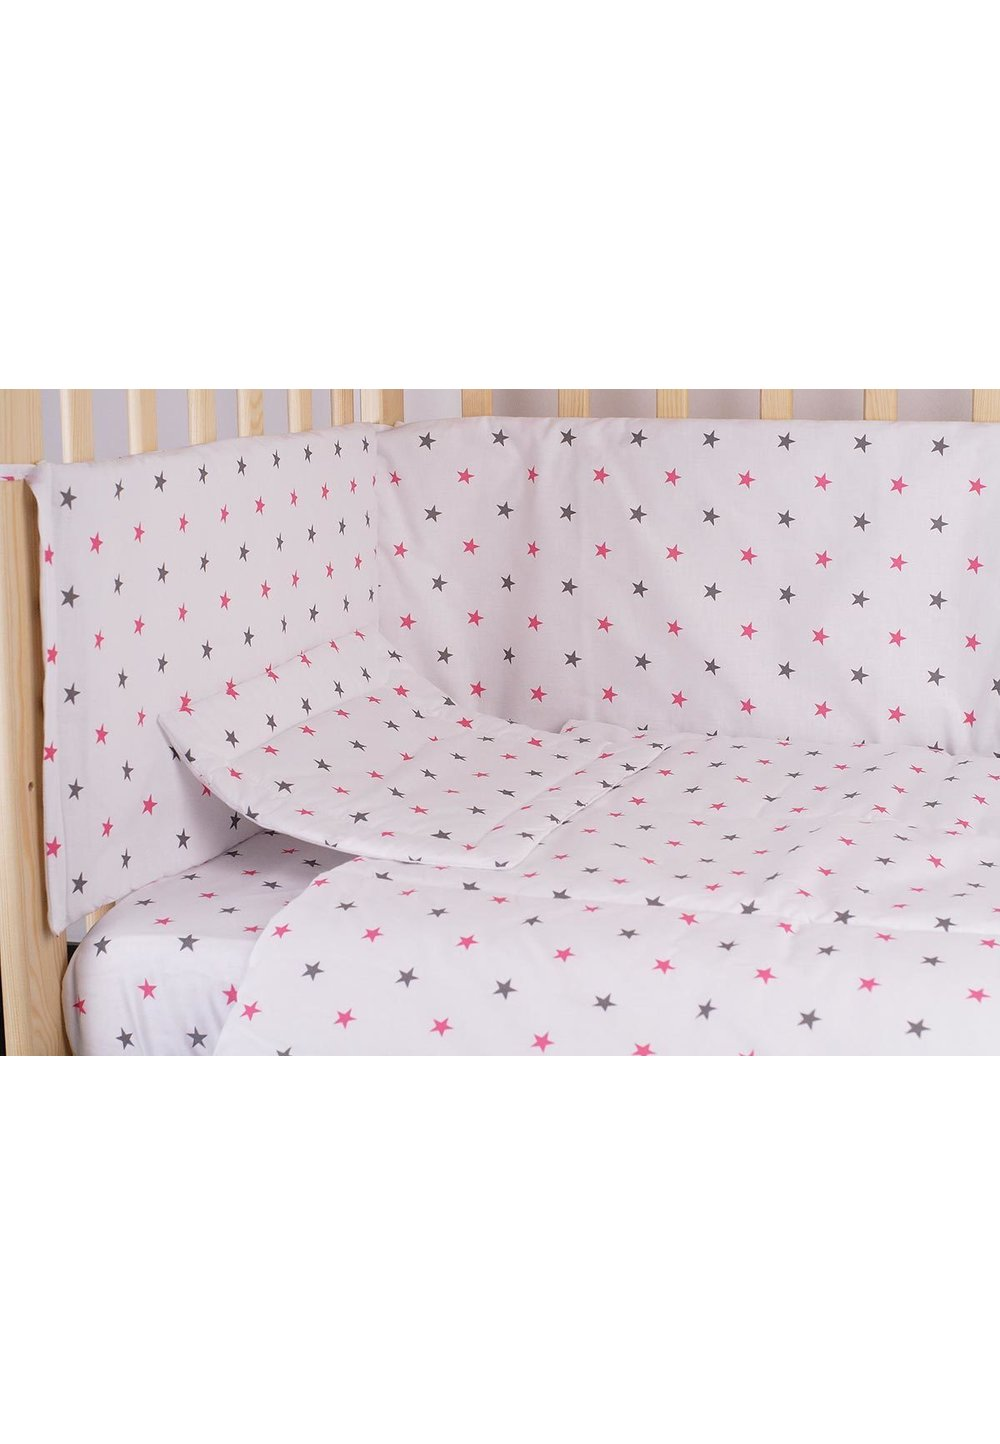 Lenjerie alba,stelute roz cu gri,3 piese, 120 x 60 imagine